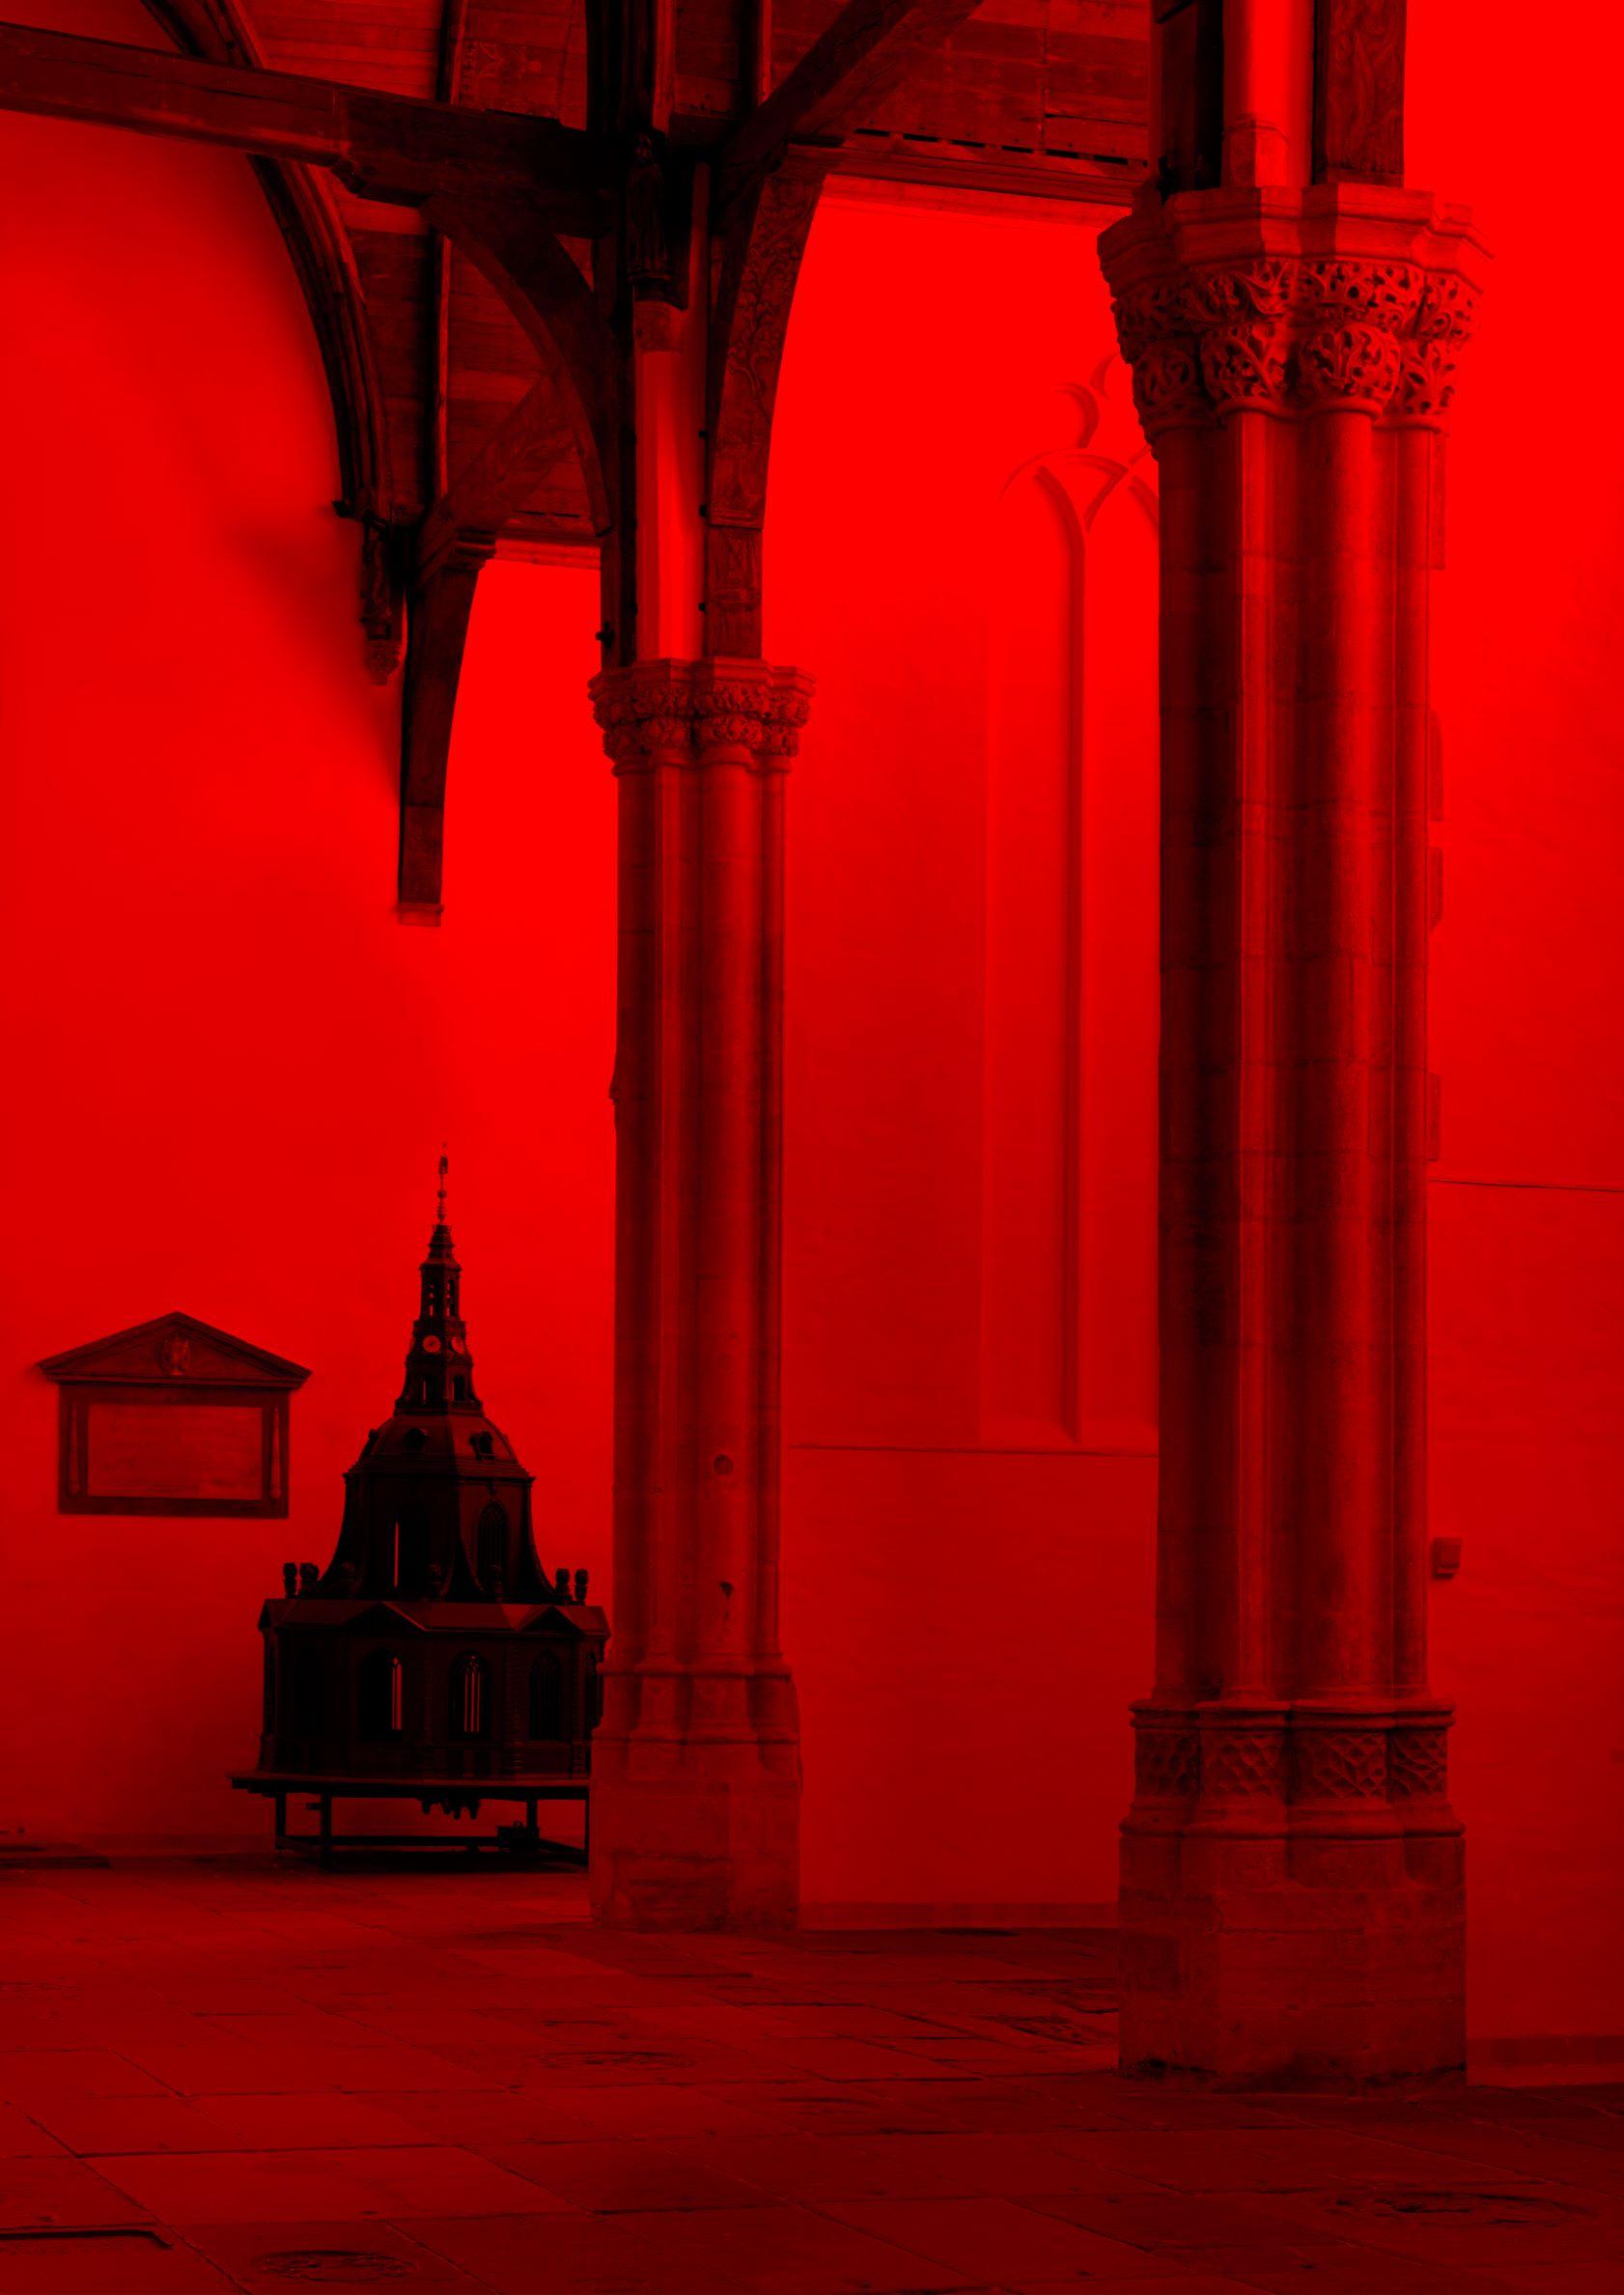 Giorgio Andreotta Calò, Anàstasis (ἀνάστασις), 2018; Veduta dell'installazione, Oude Kerk, Amsterdam, 2018. Courtesy Studio Giorgio Andreotta Calò, Venezia. Foto: Gert Jan Van Rooij